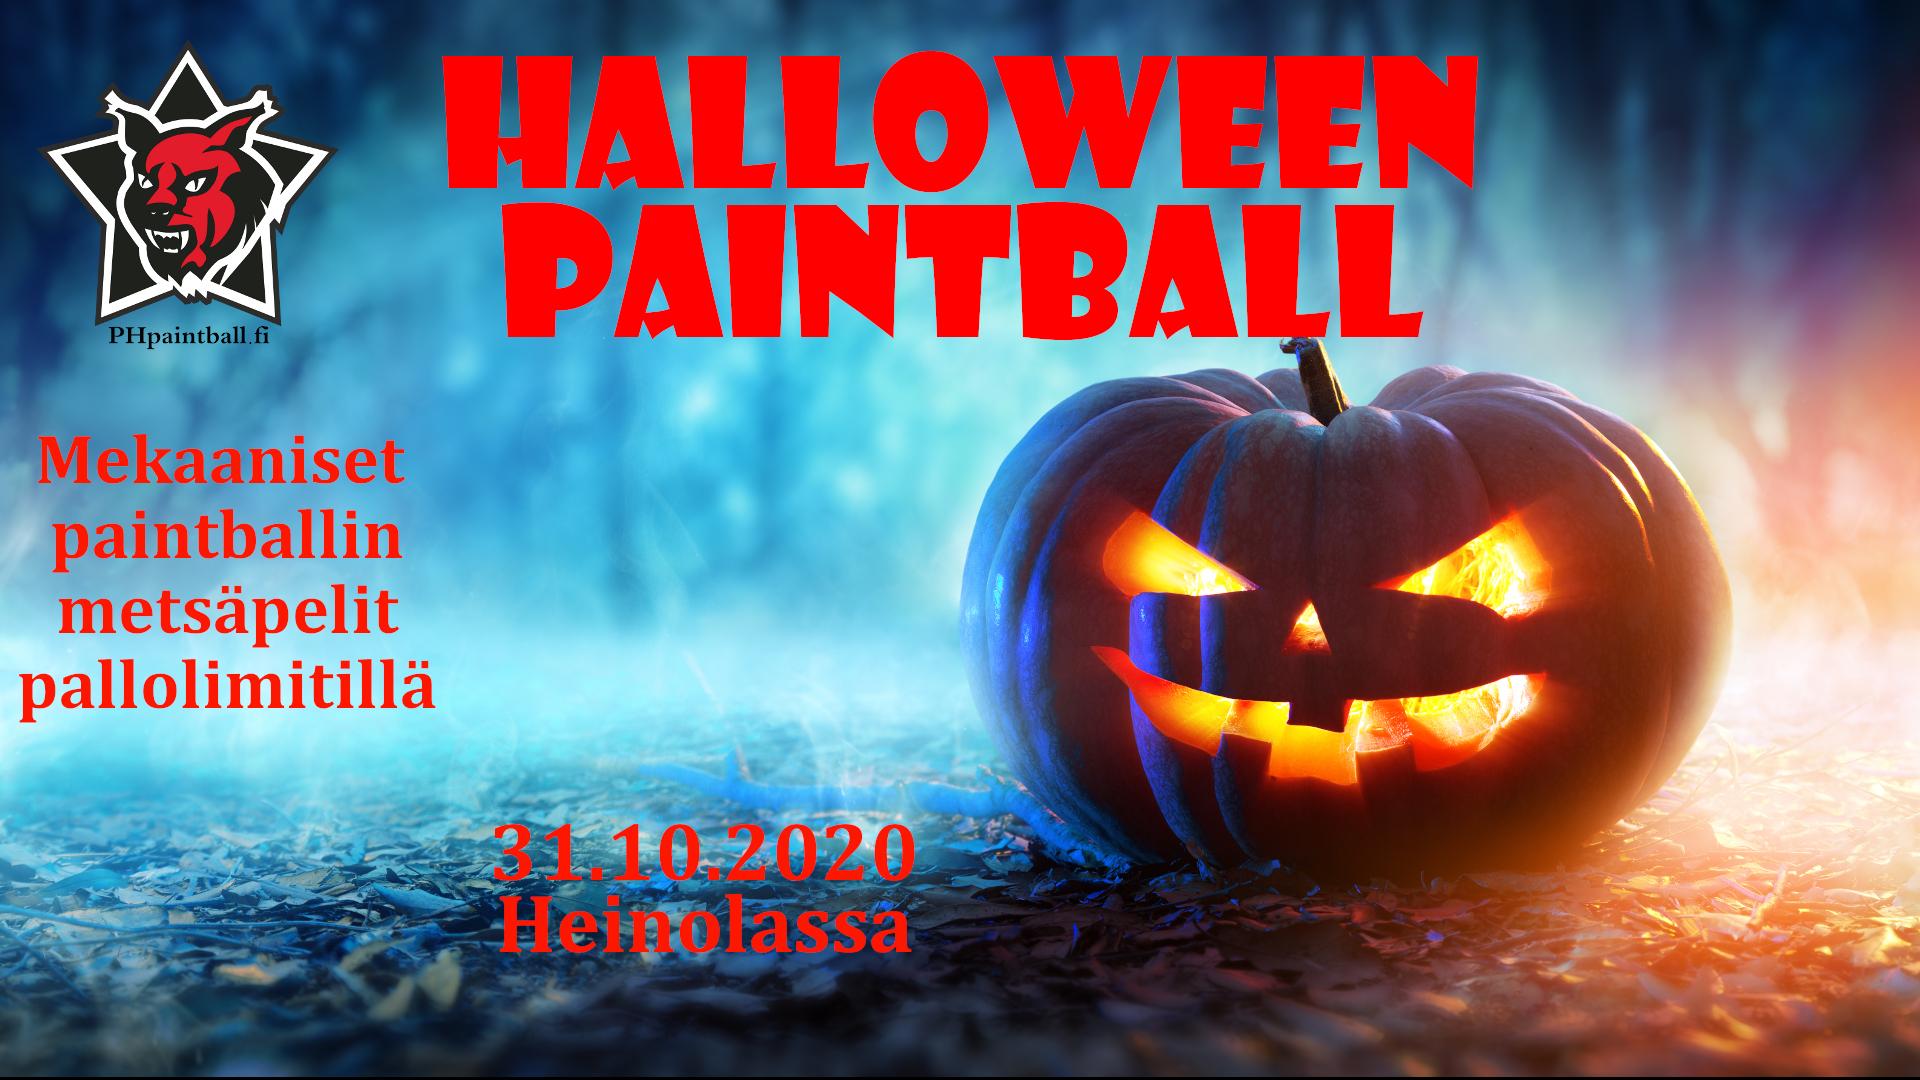 halloweenpaintball2020.jpg